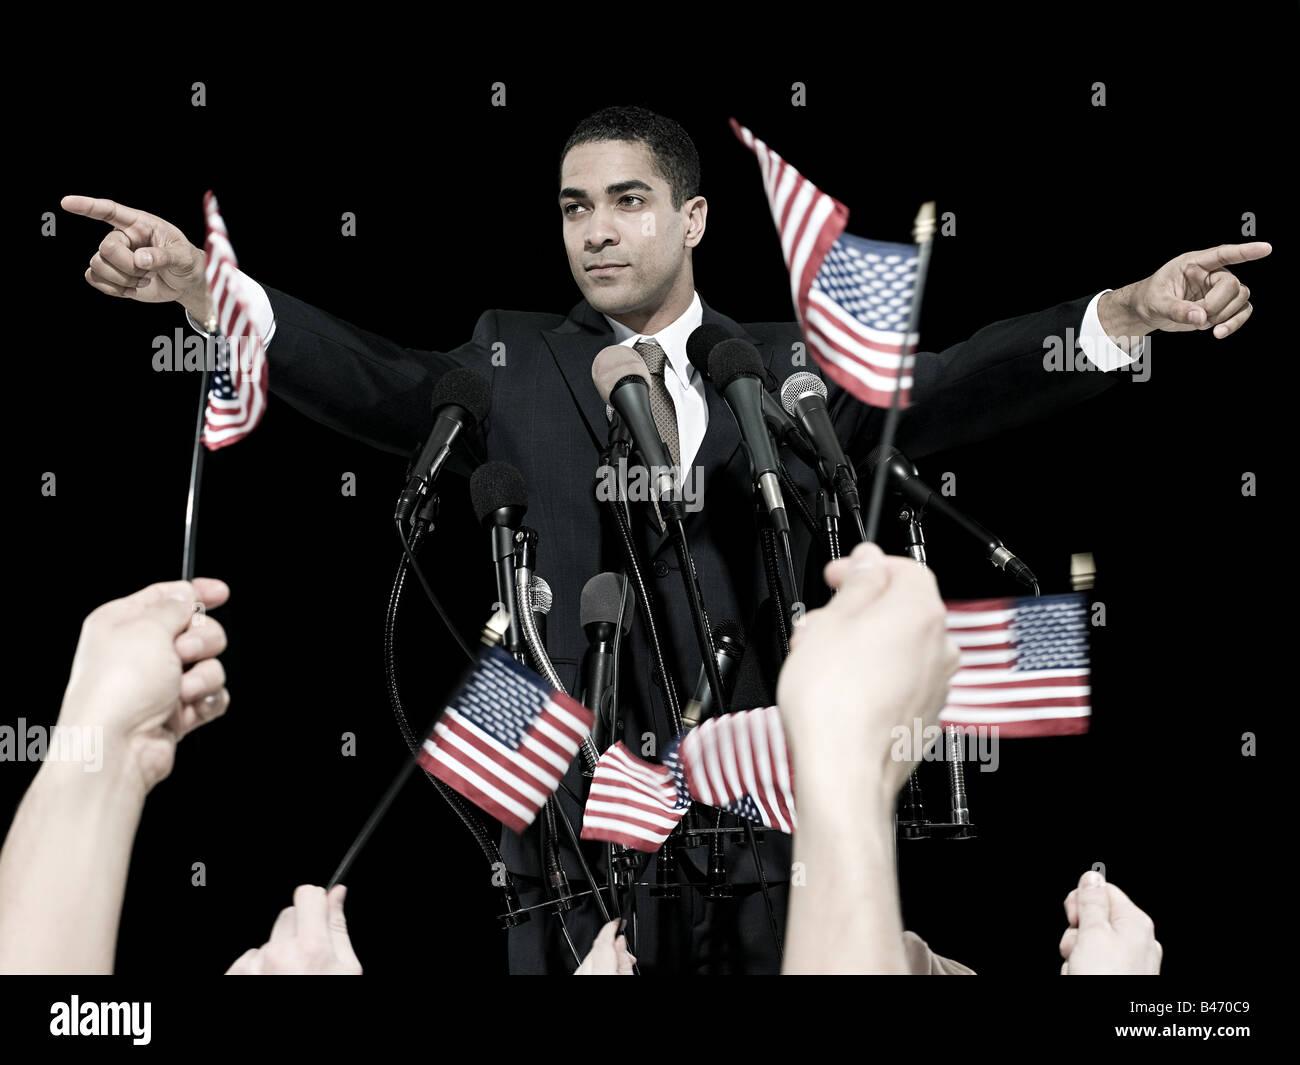 Politiker und Anhänger Stockbild